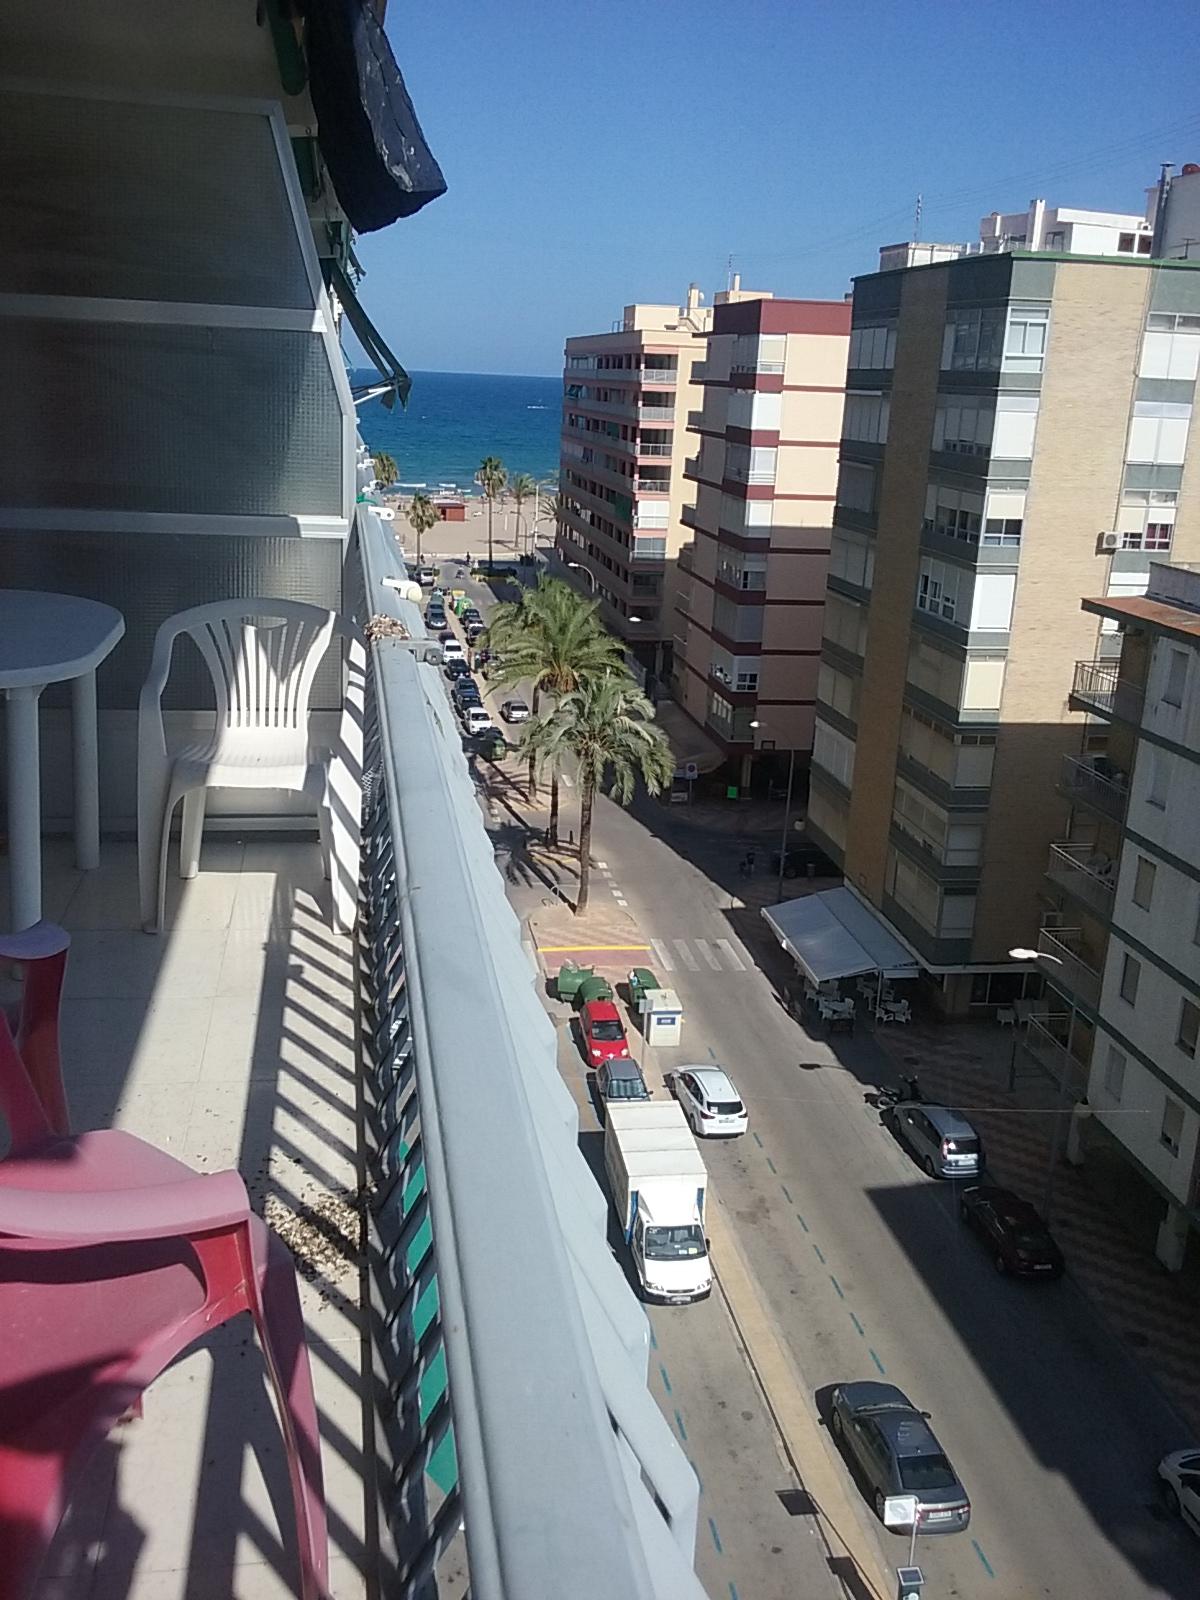 Inmobiliaria gestitur apartamento zona san antonio san antonio 4455 inmobiliaria cullera - Venta apartamentos playa cullera ...